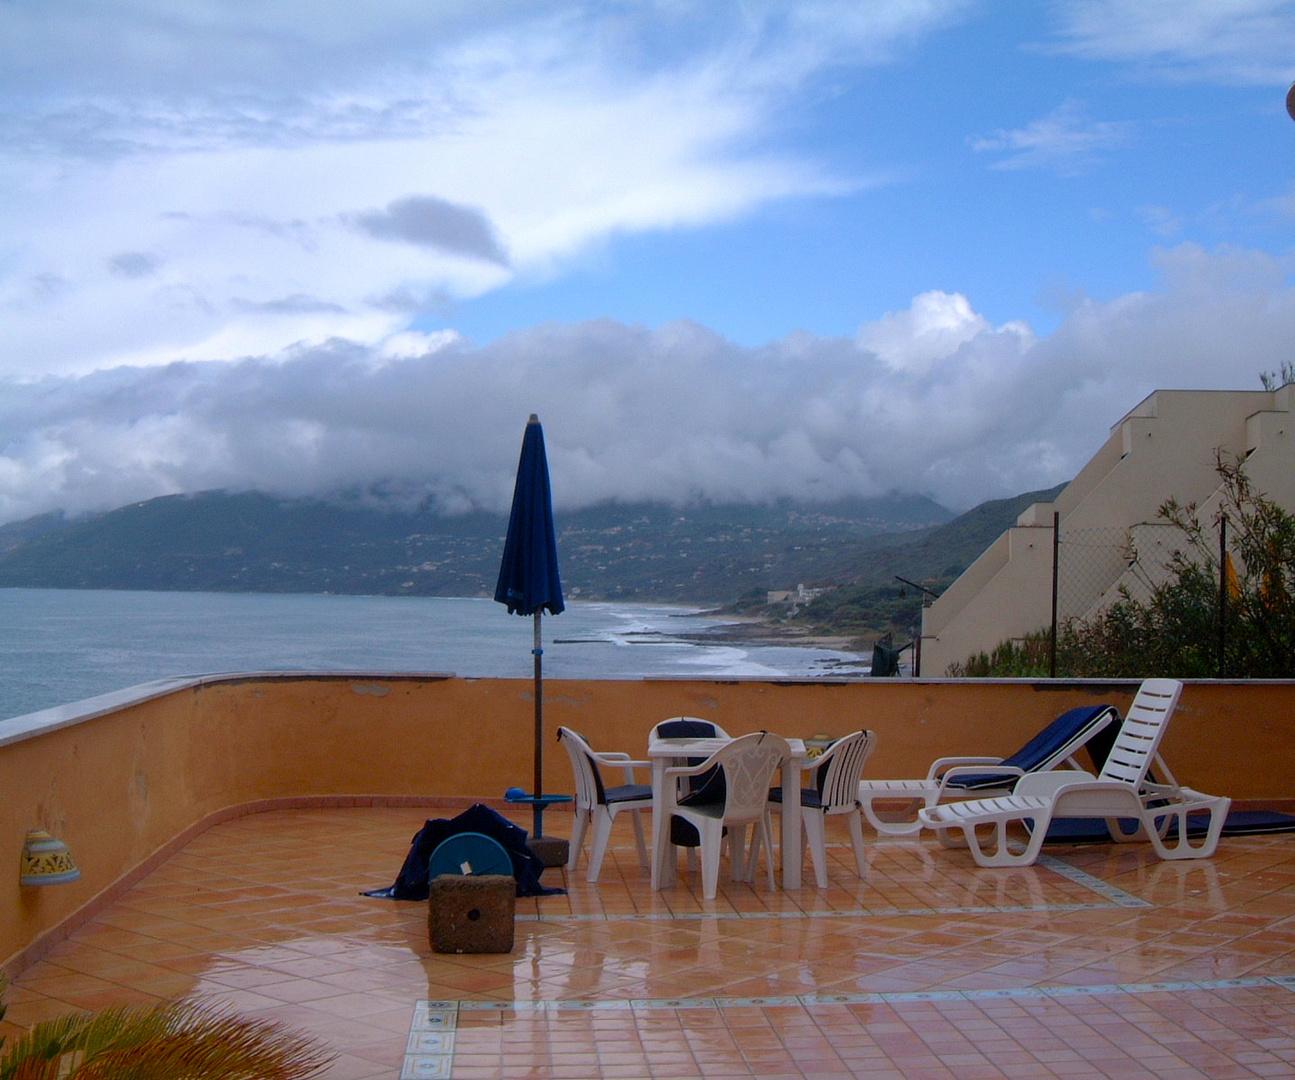 Capu Palinuro, after the Rain